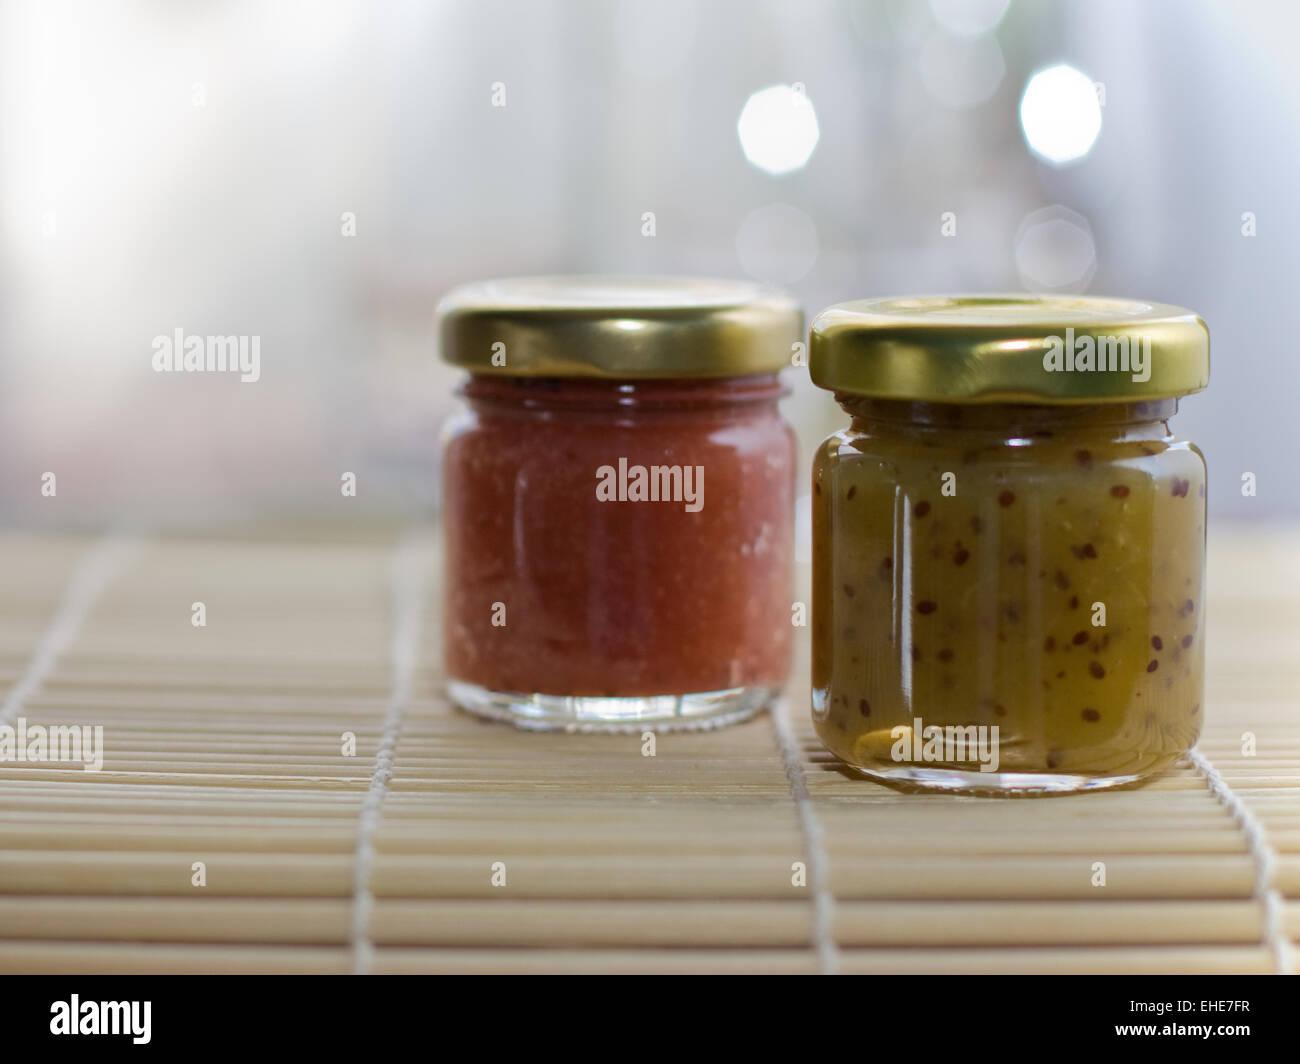 Marmeladenglaser Stock Photos Marmeladenglaser Stock Images Alamy